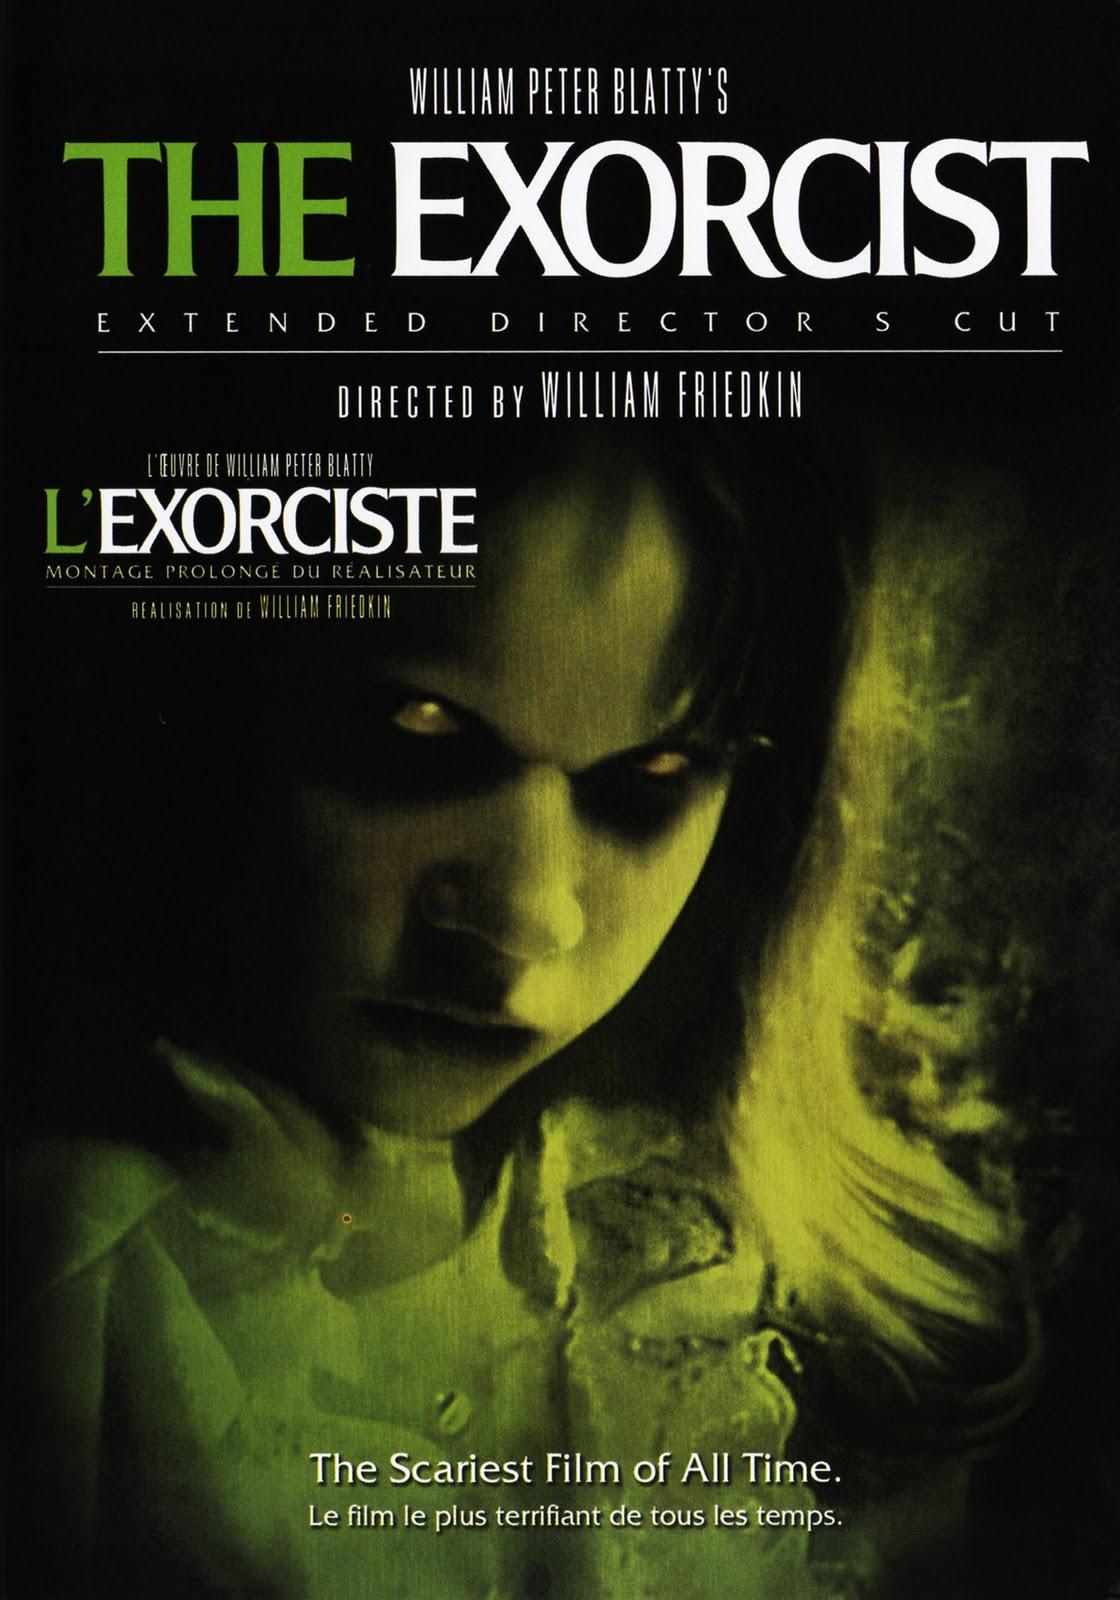 8023 - The Exorcist - Qủy Ám